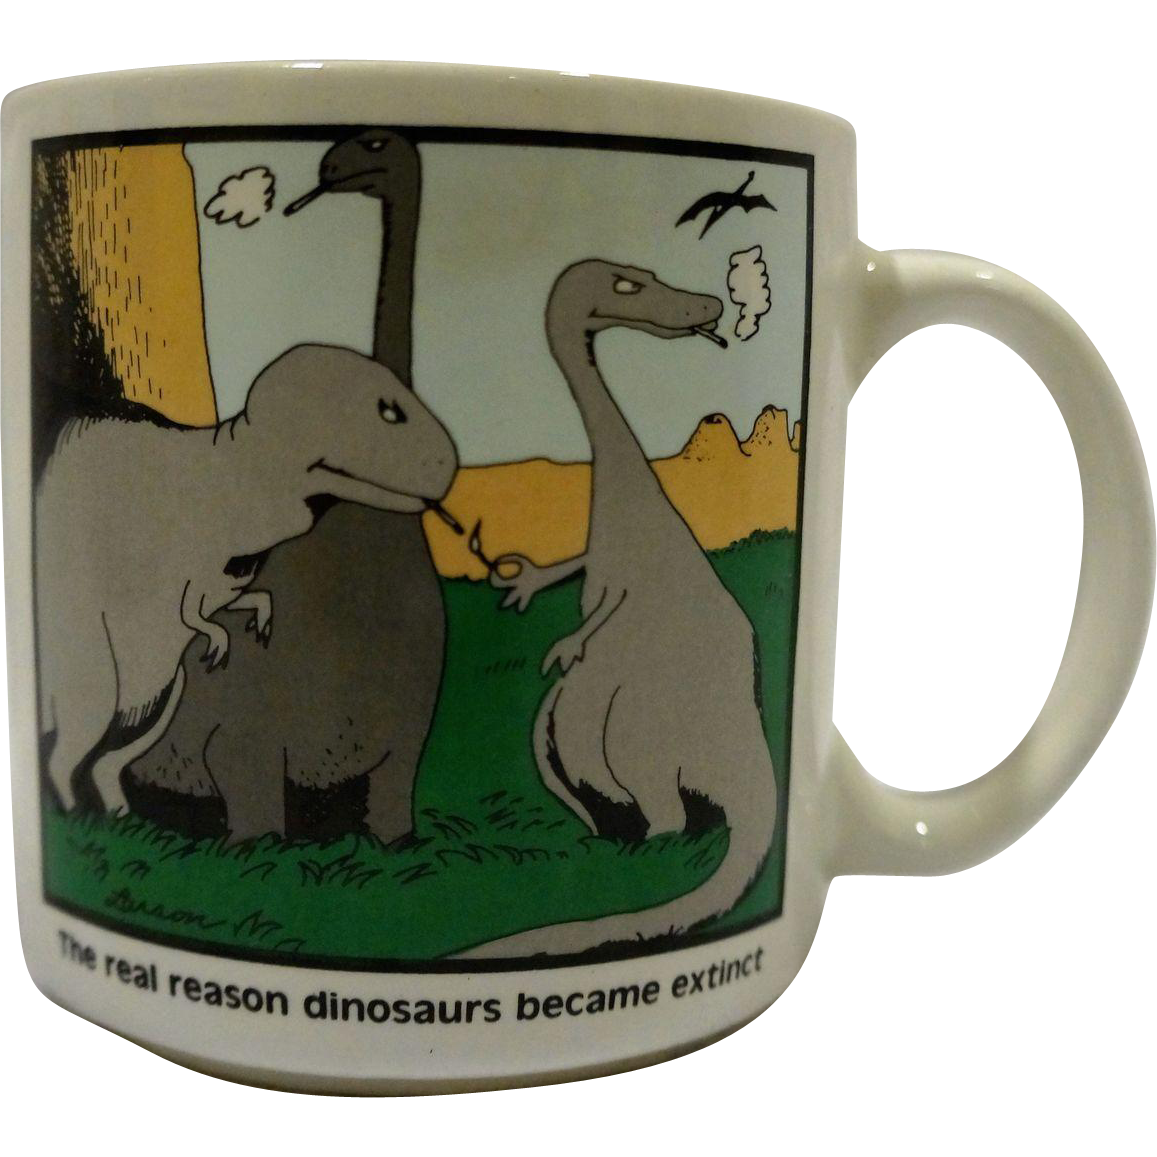 The Far Side The Real Reason Dinosaurs Became Extinct Mug Gary Larson